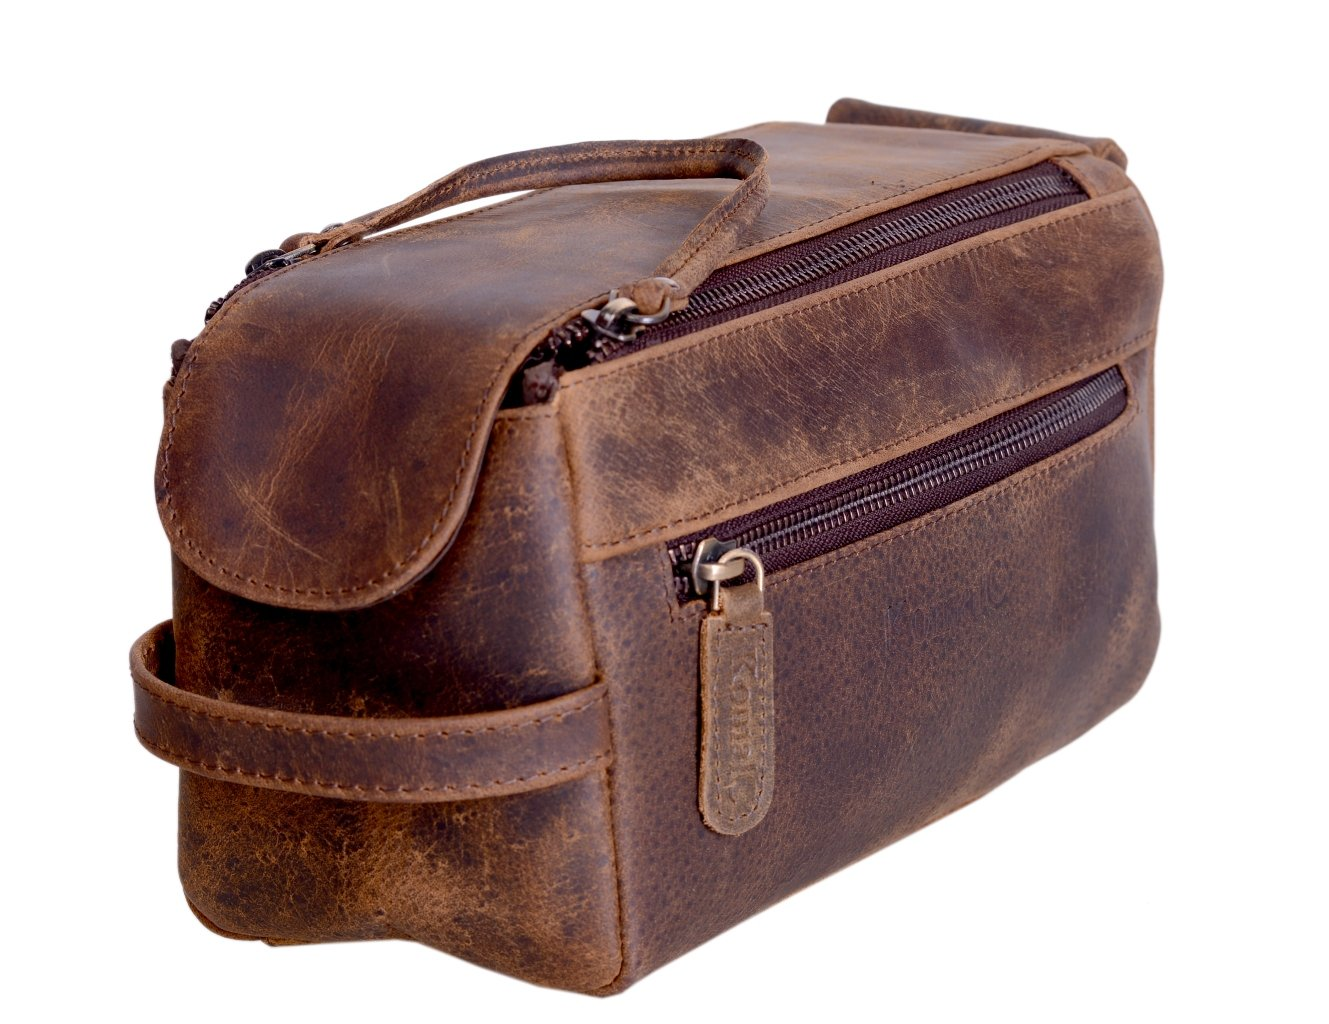 KOMALC Genuine Buffalo Leather Unisex Toiletry Bag Travel Dopp Kit 31352